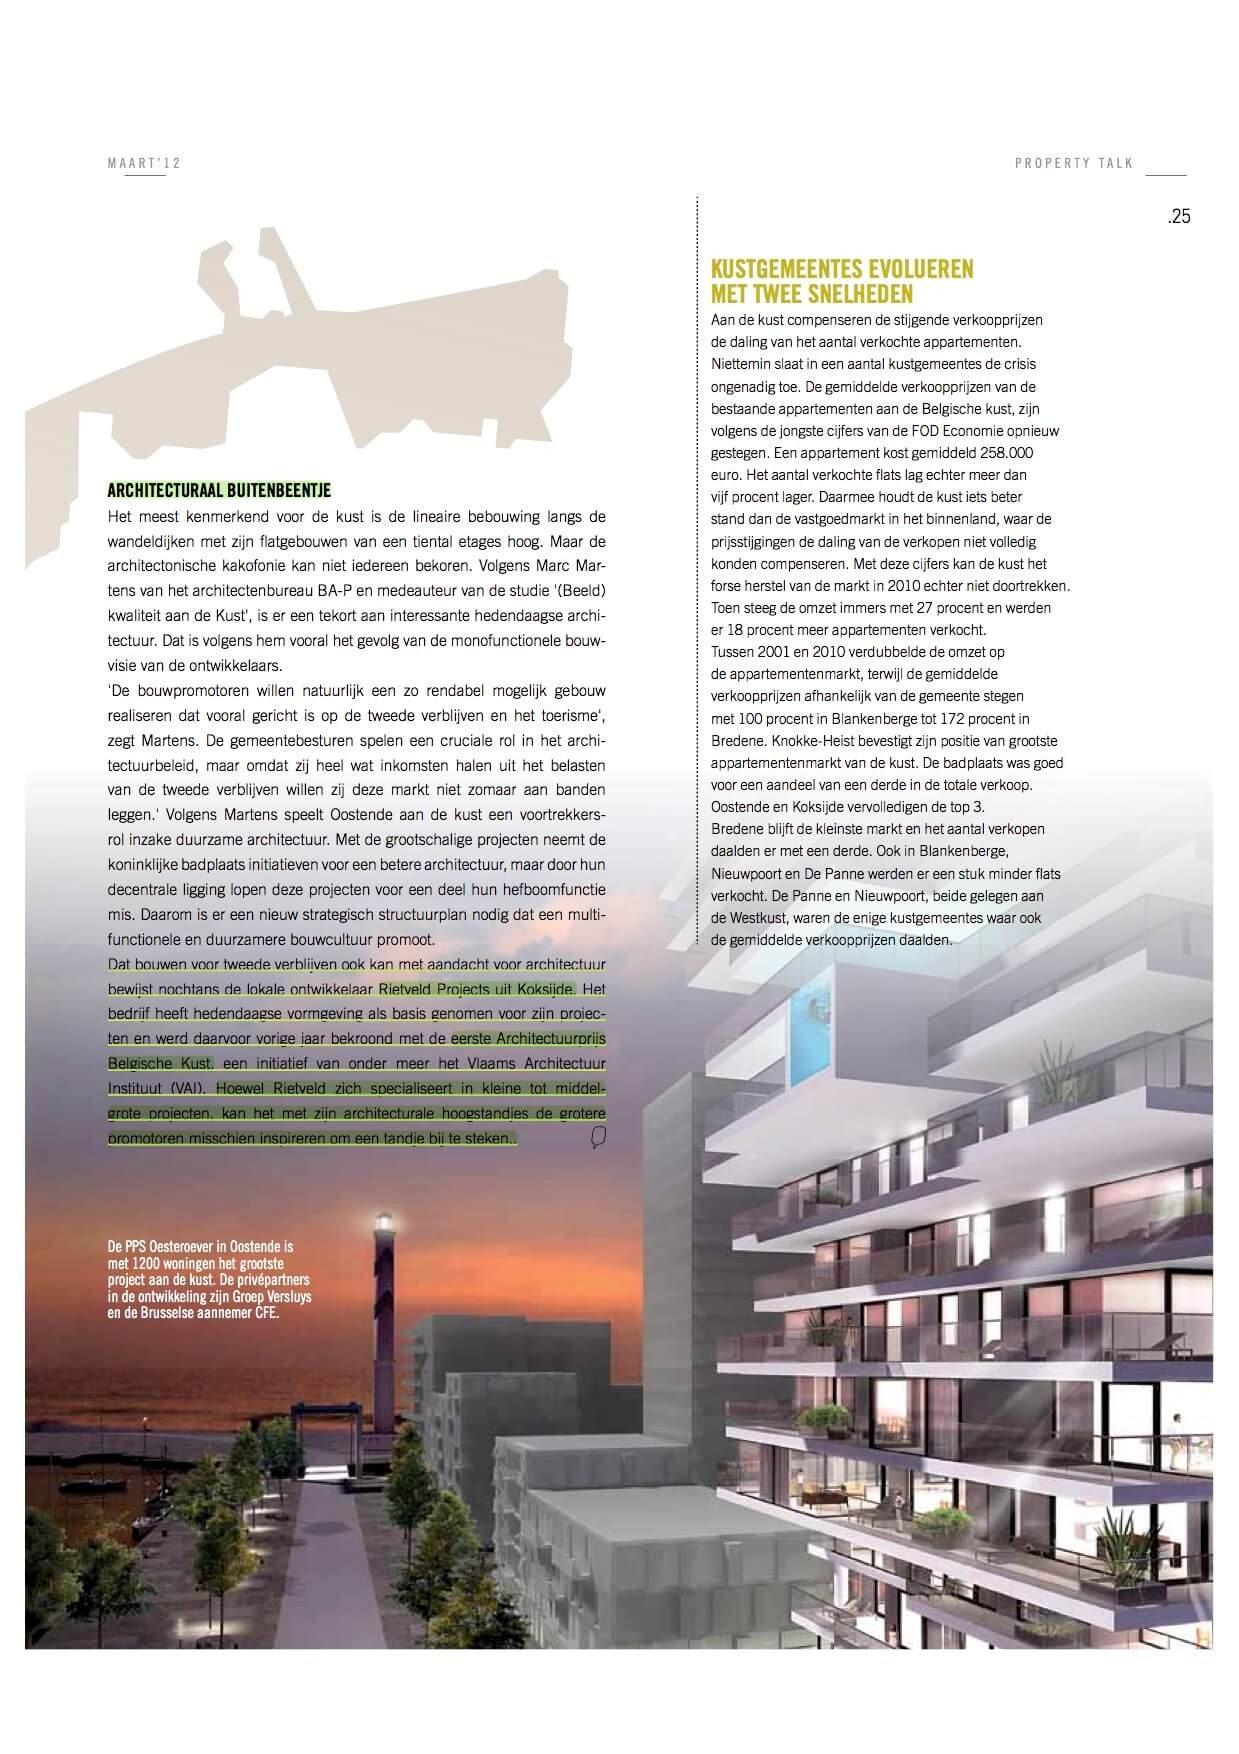 Property Talk - Rietveldprojects 2.jpg